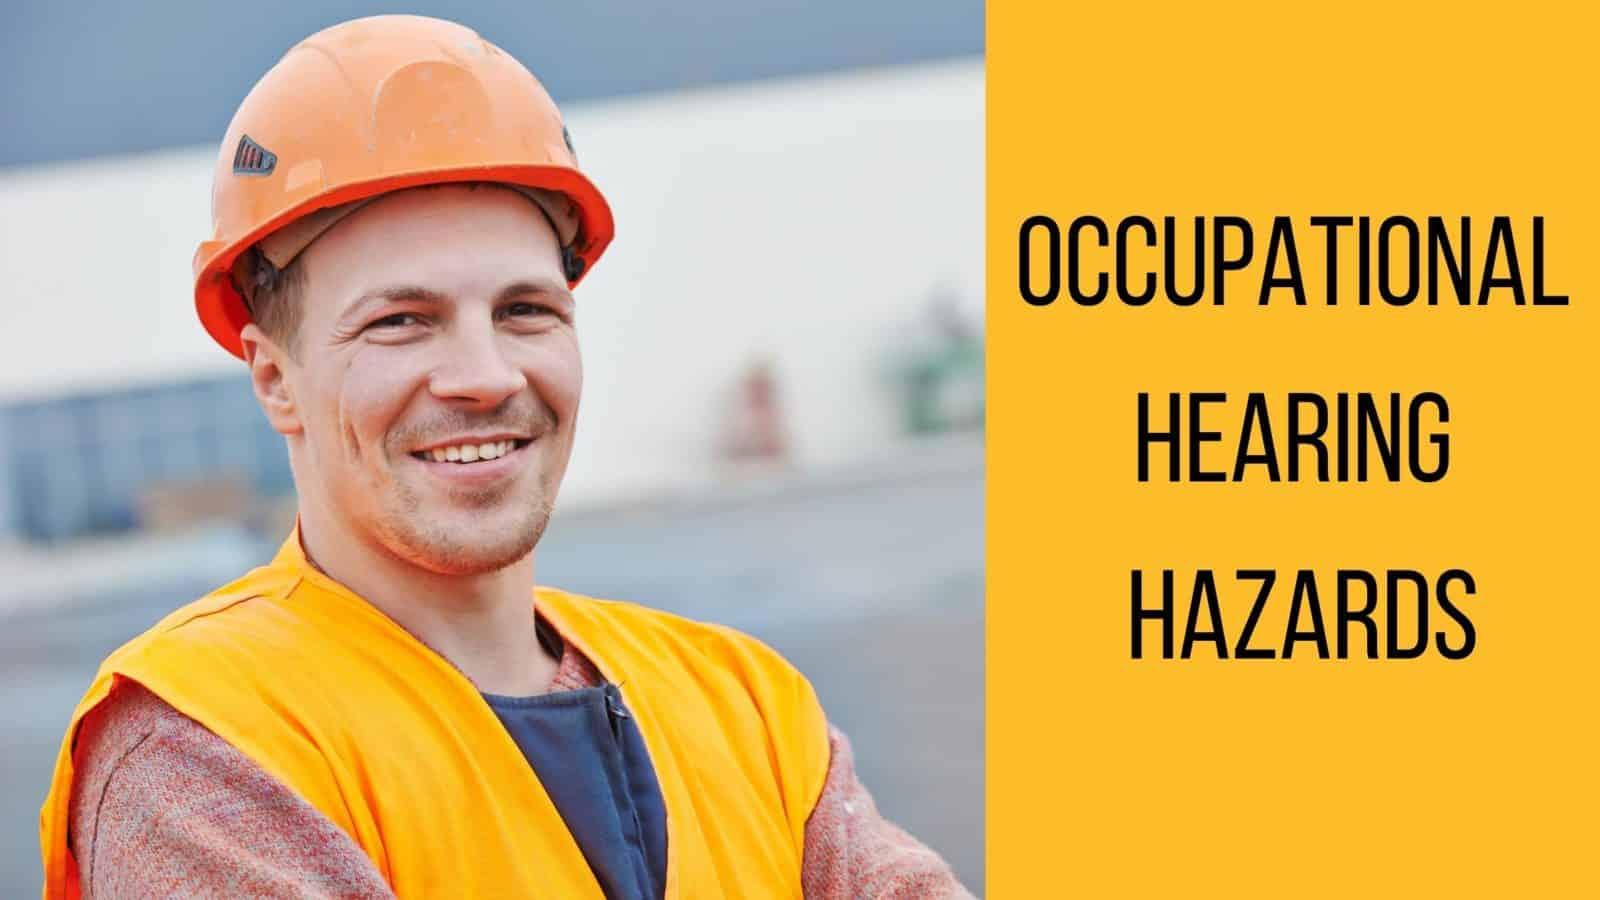 Occupational-Hearing-Hazards